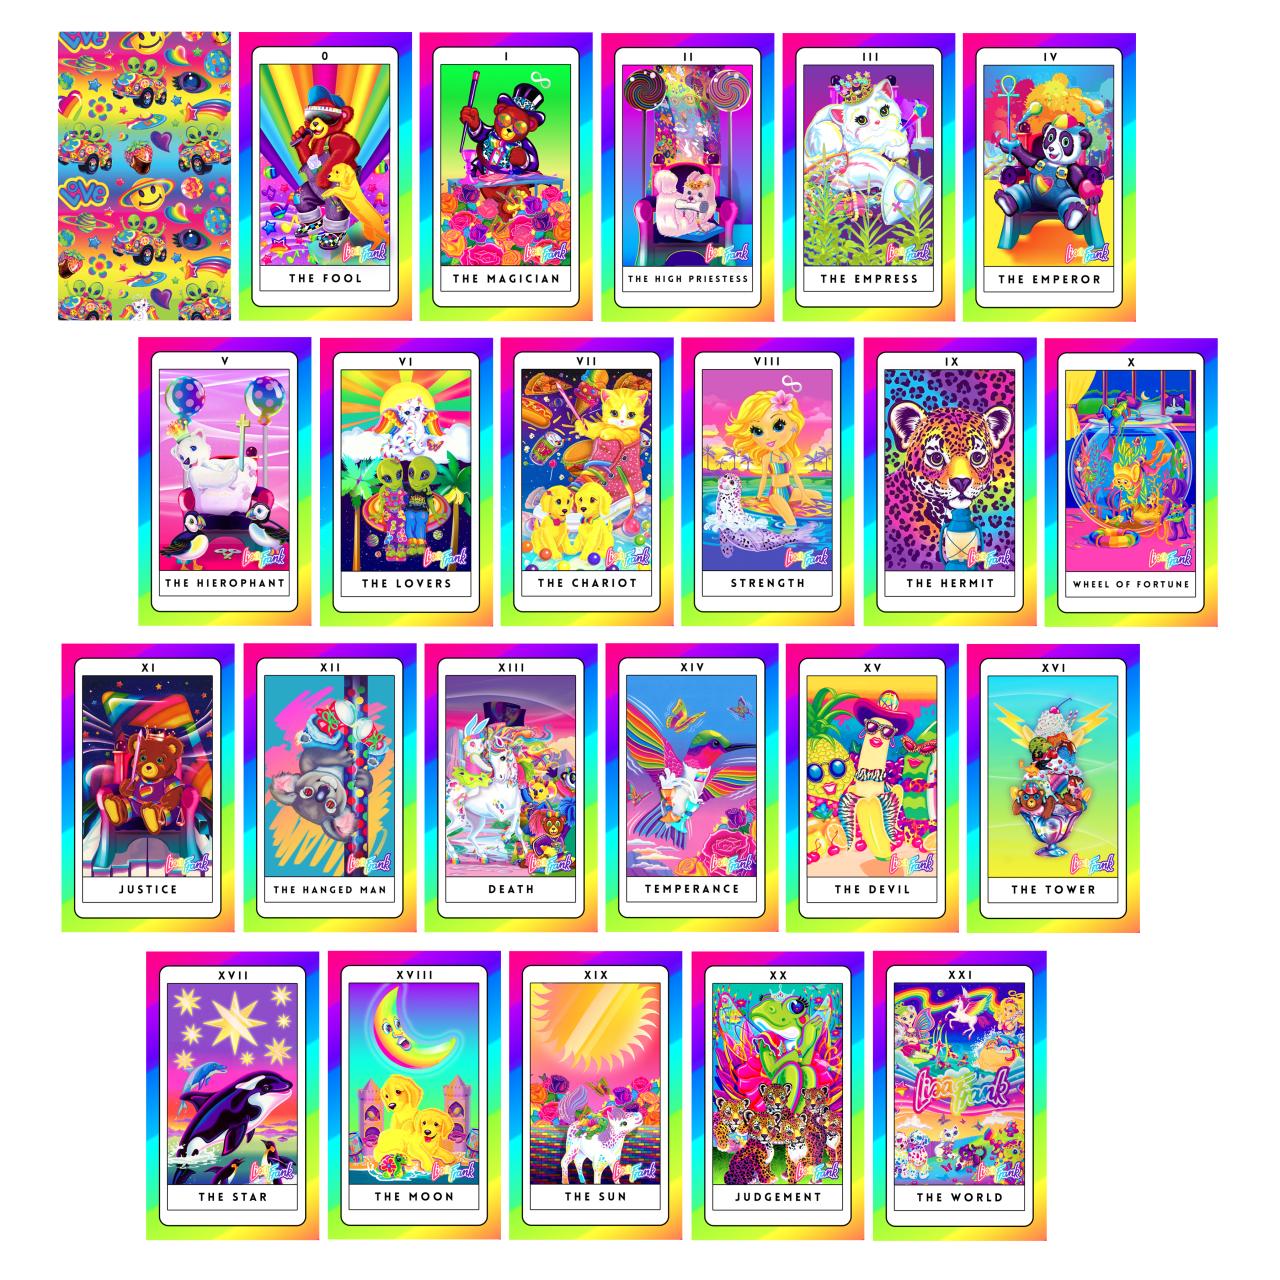 Printable Tarot Cards - Printable Cards - Free Printable Tarot Cards